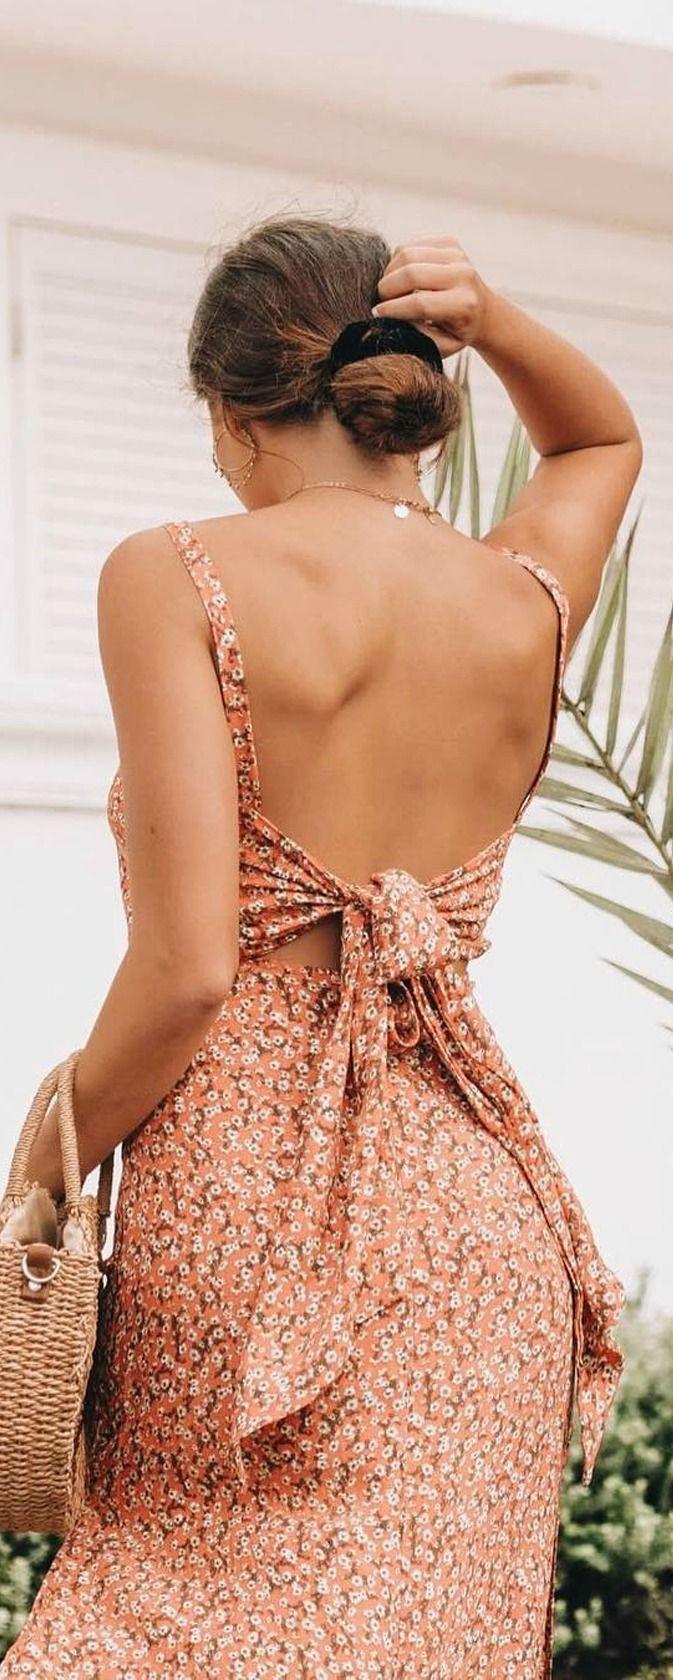 Katergo Coral Pink Floral Print Backless Midi Dress